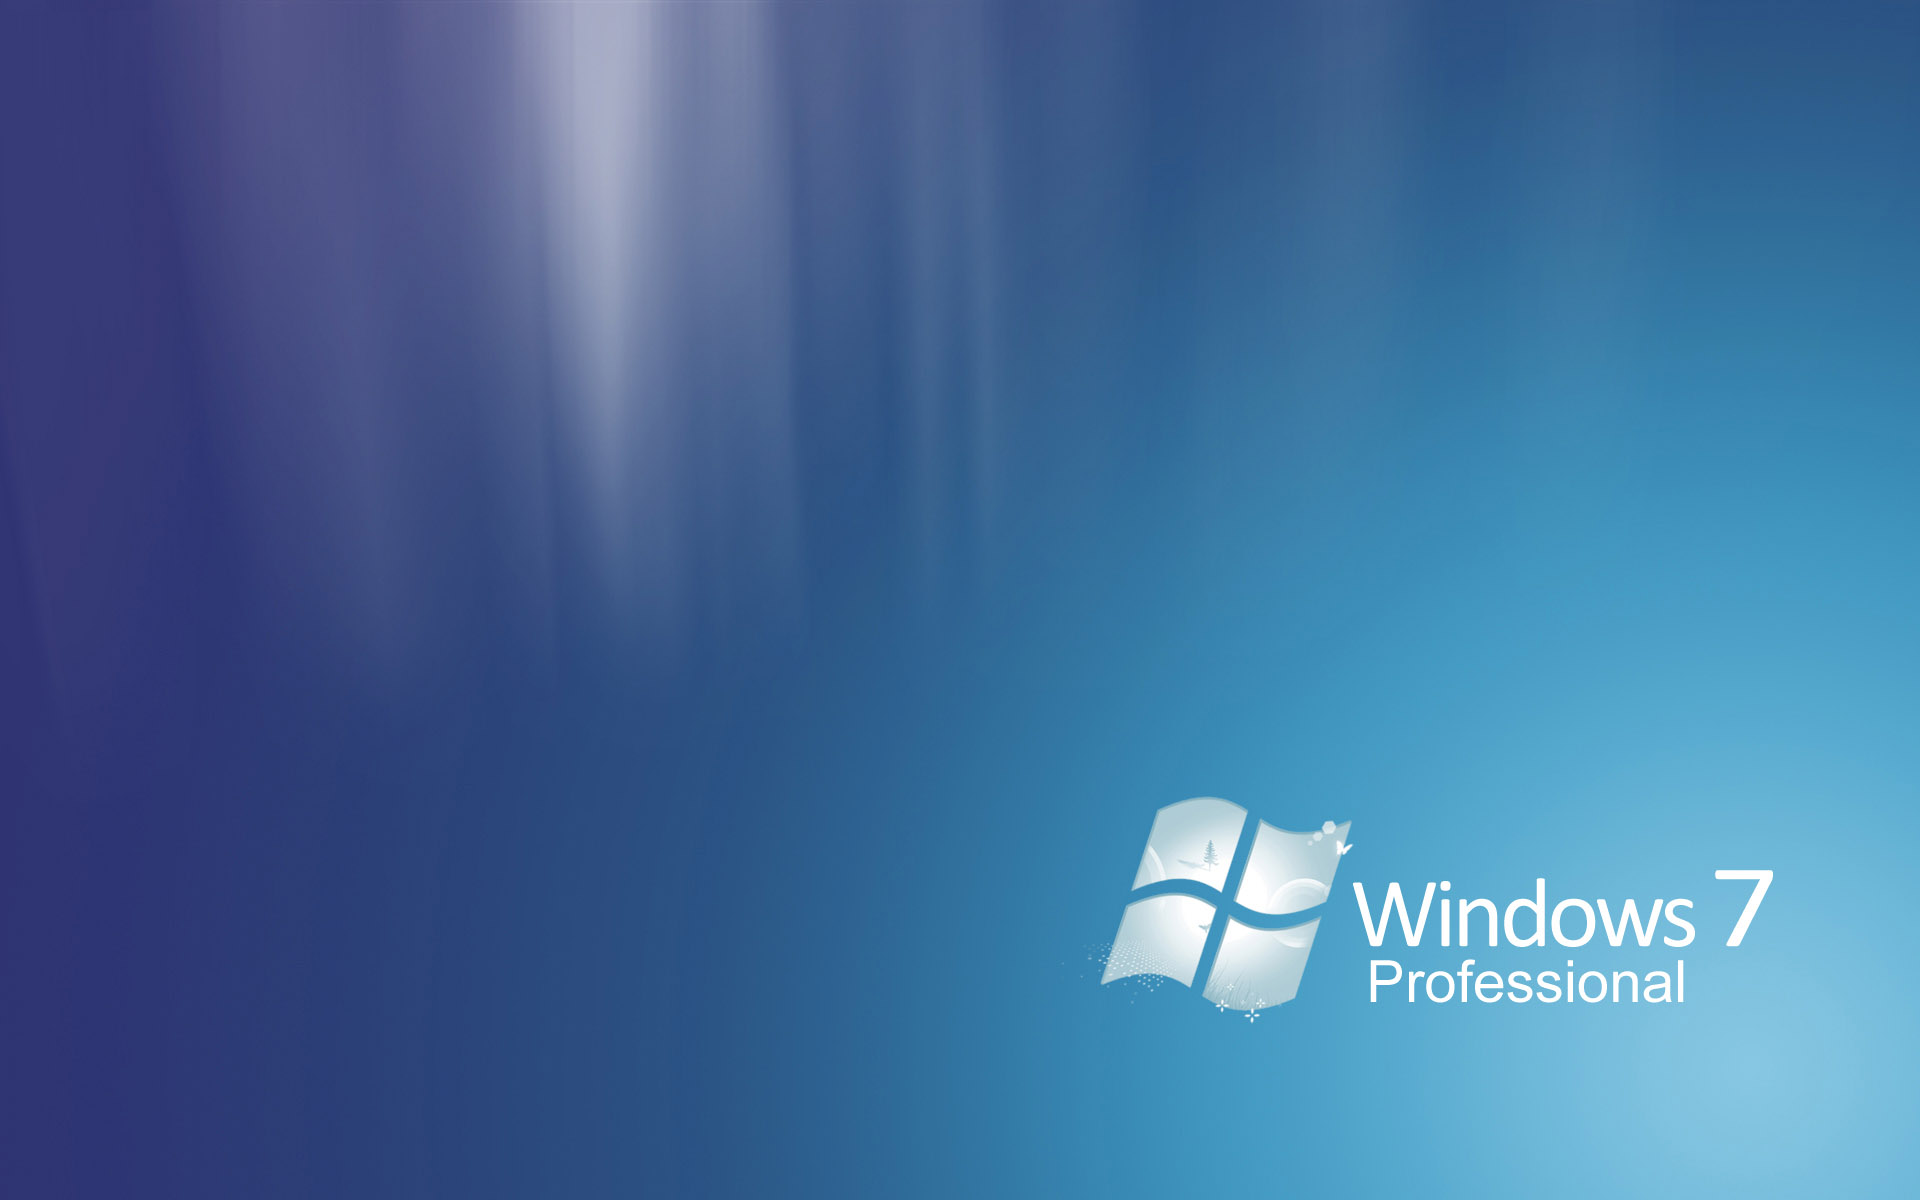 20 1200windows7梦幻桌面下载壁纸,windows7梦幻桌面下载壁纸图图片